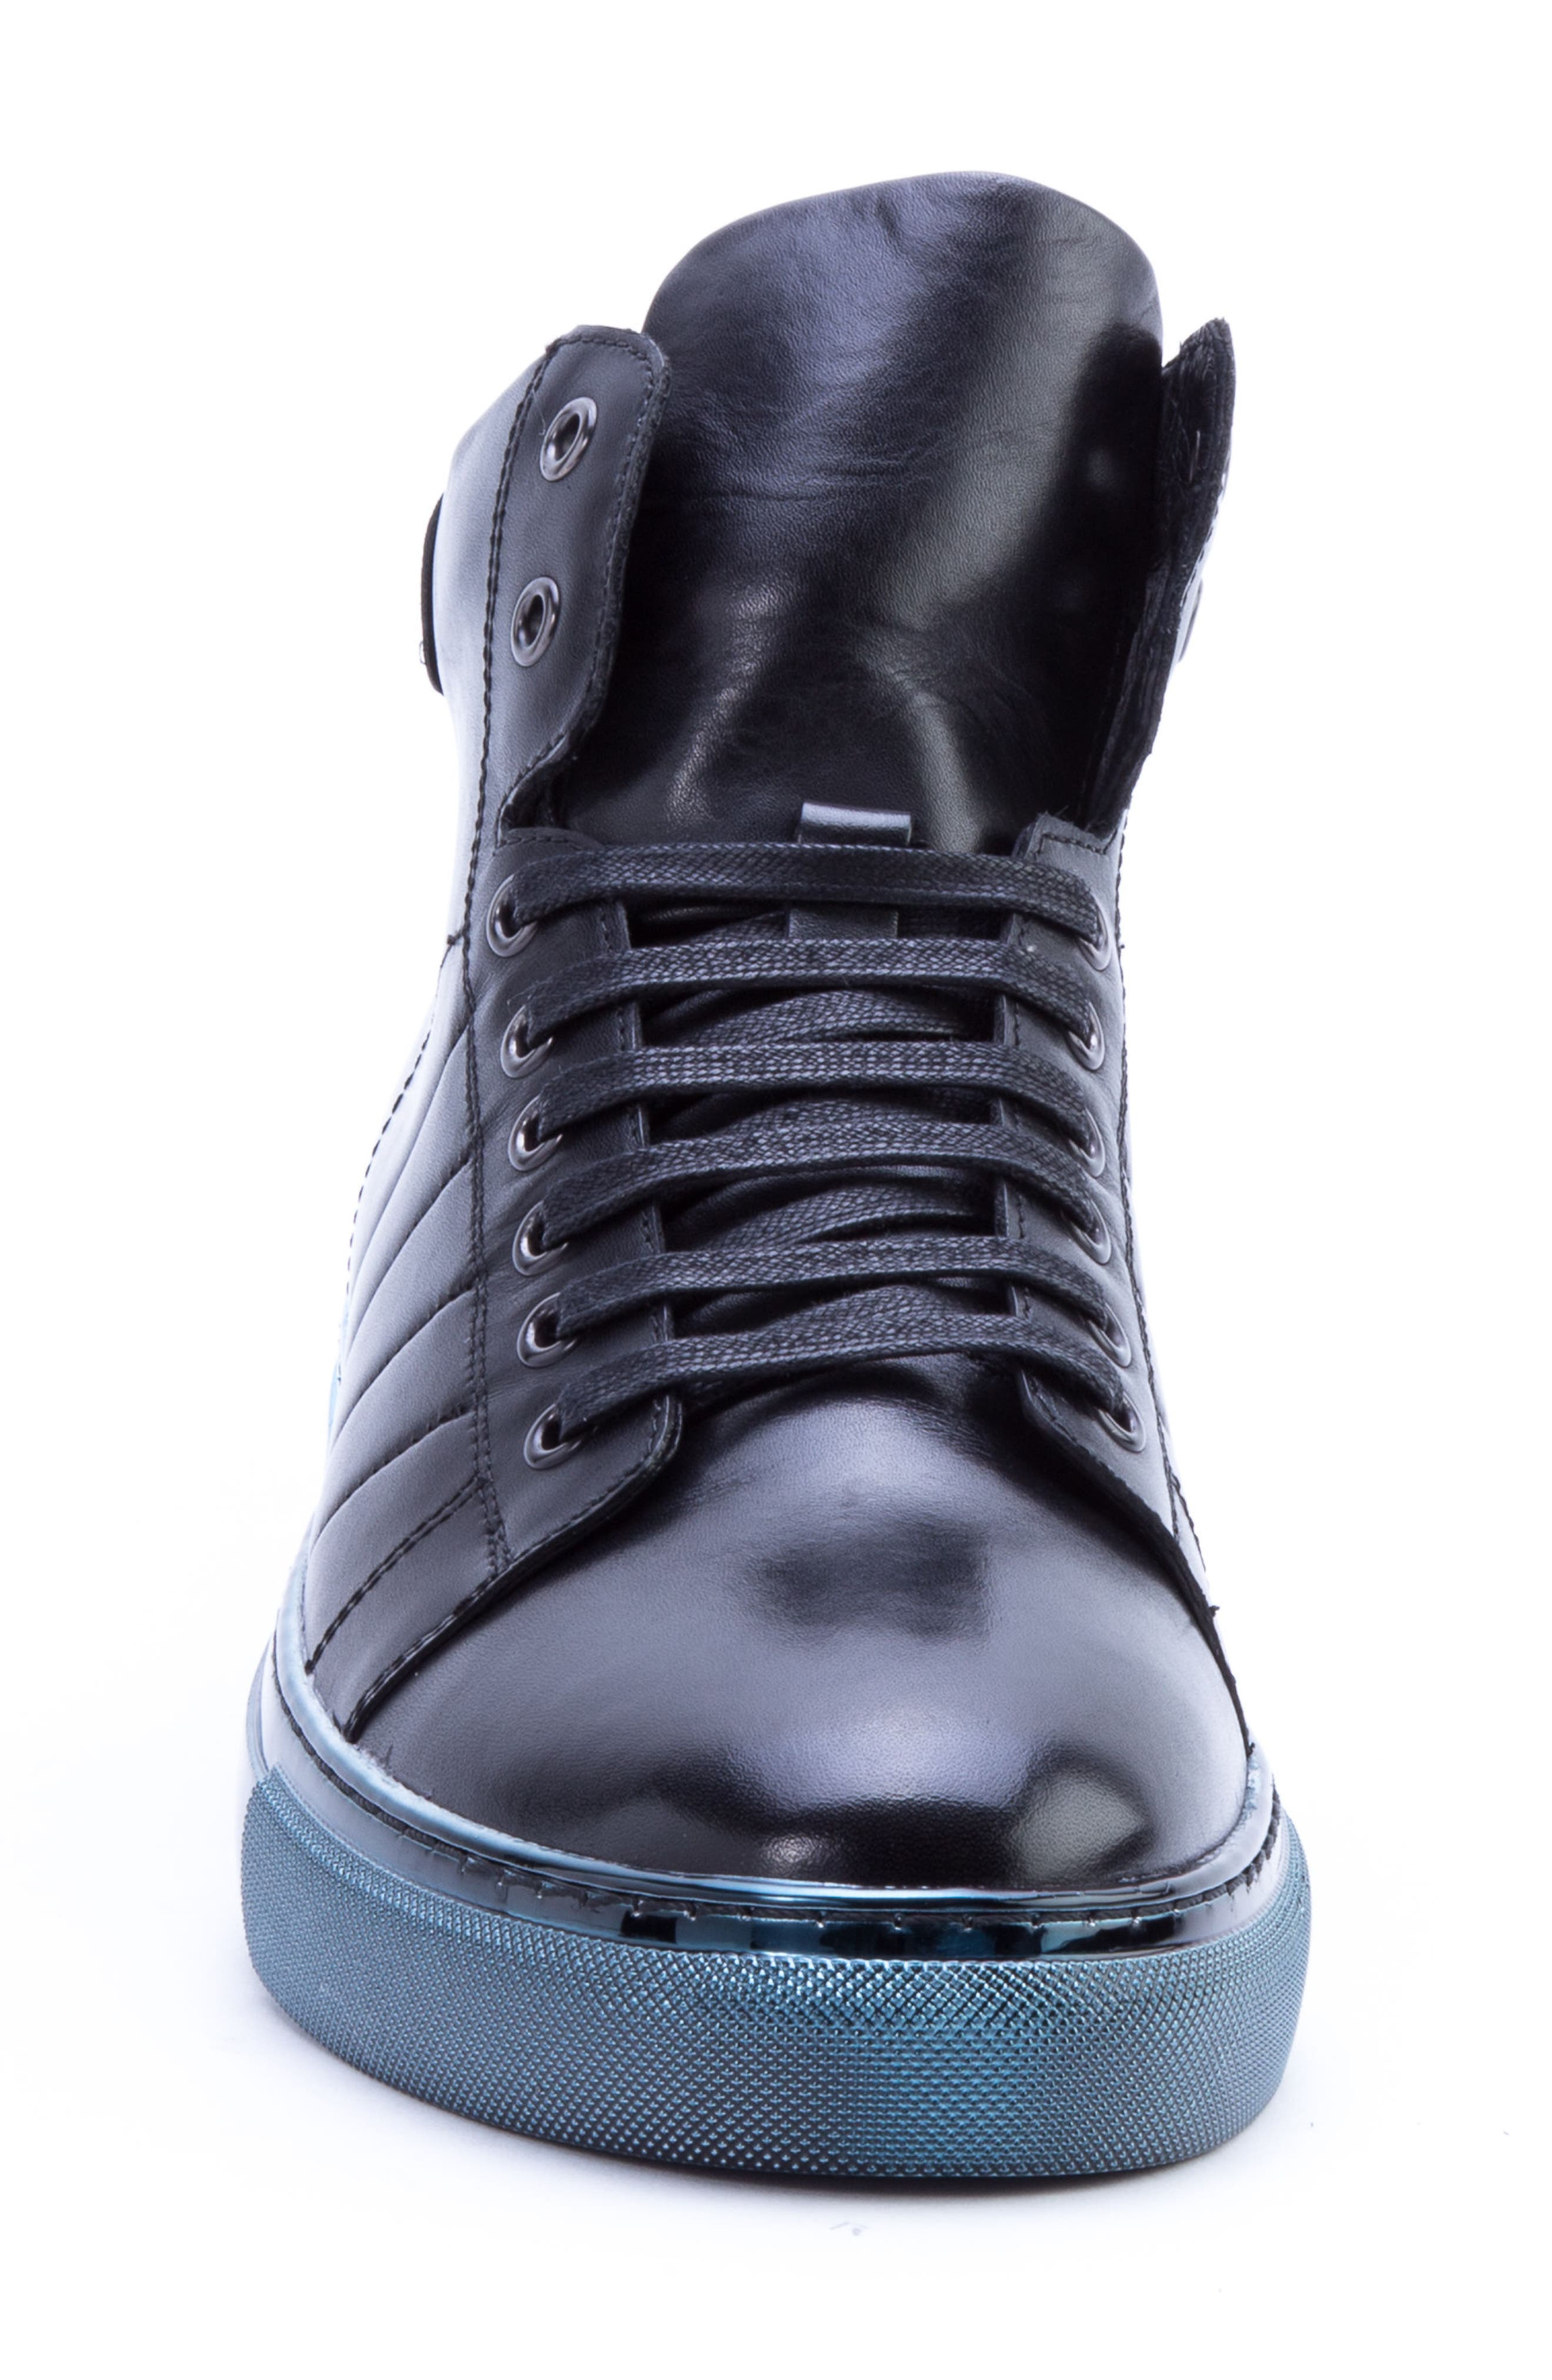 Badgley Mischka Hunter High Top Sneaker,                             Alternate thumbnail 4, color,                             NAVY LEATHER